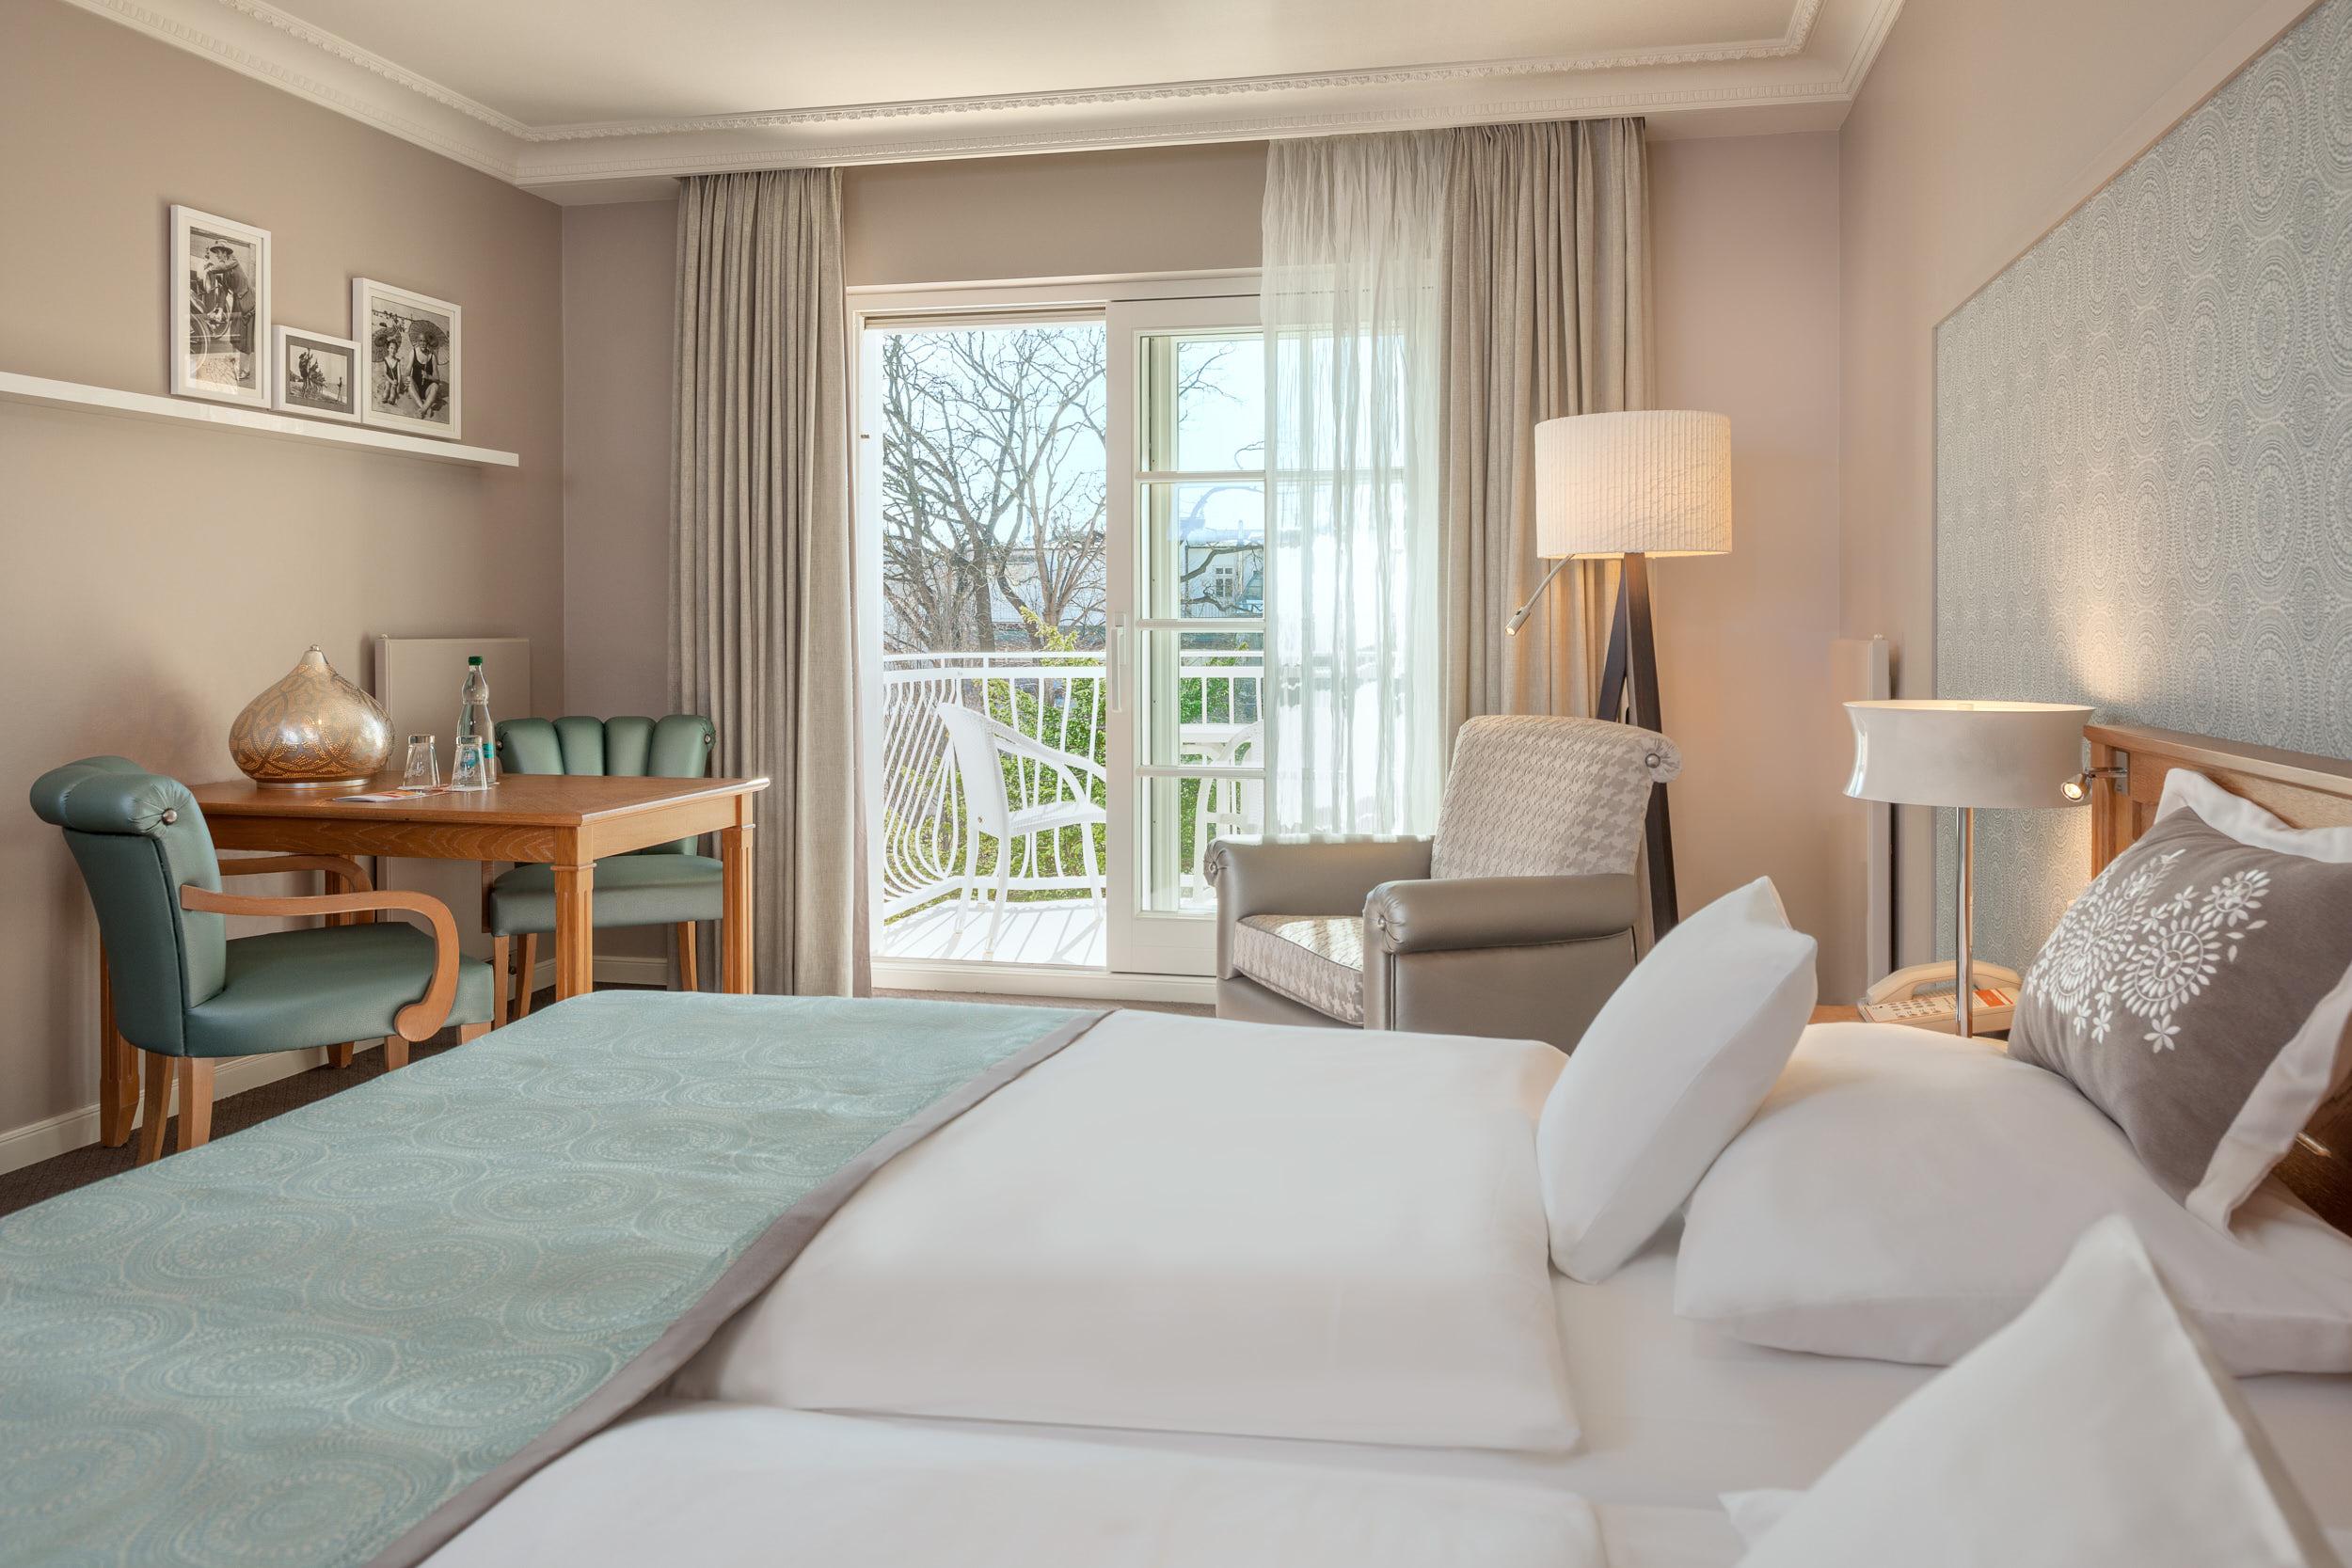 Hotelfotografie-Foto-Burwitz-Pocha 4